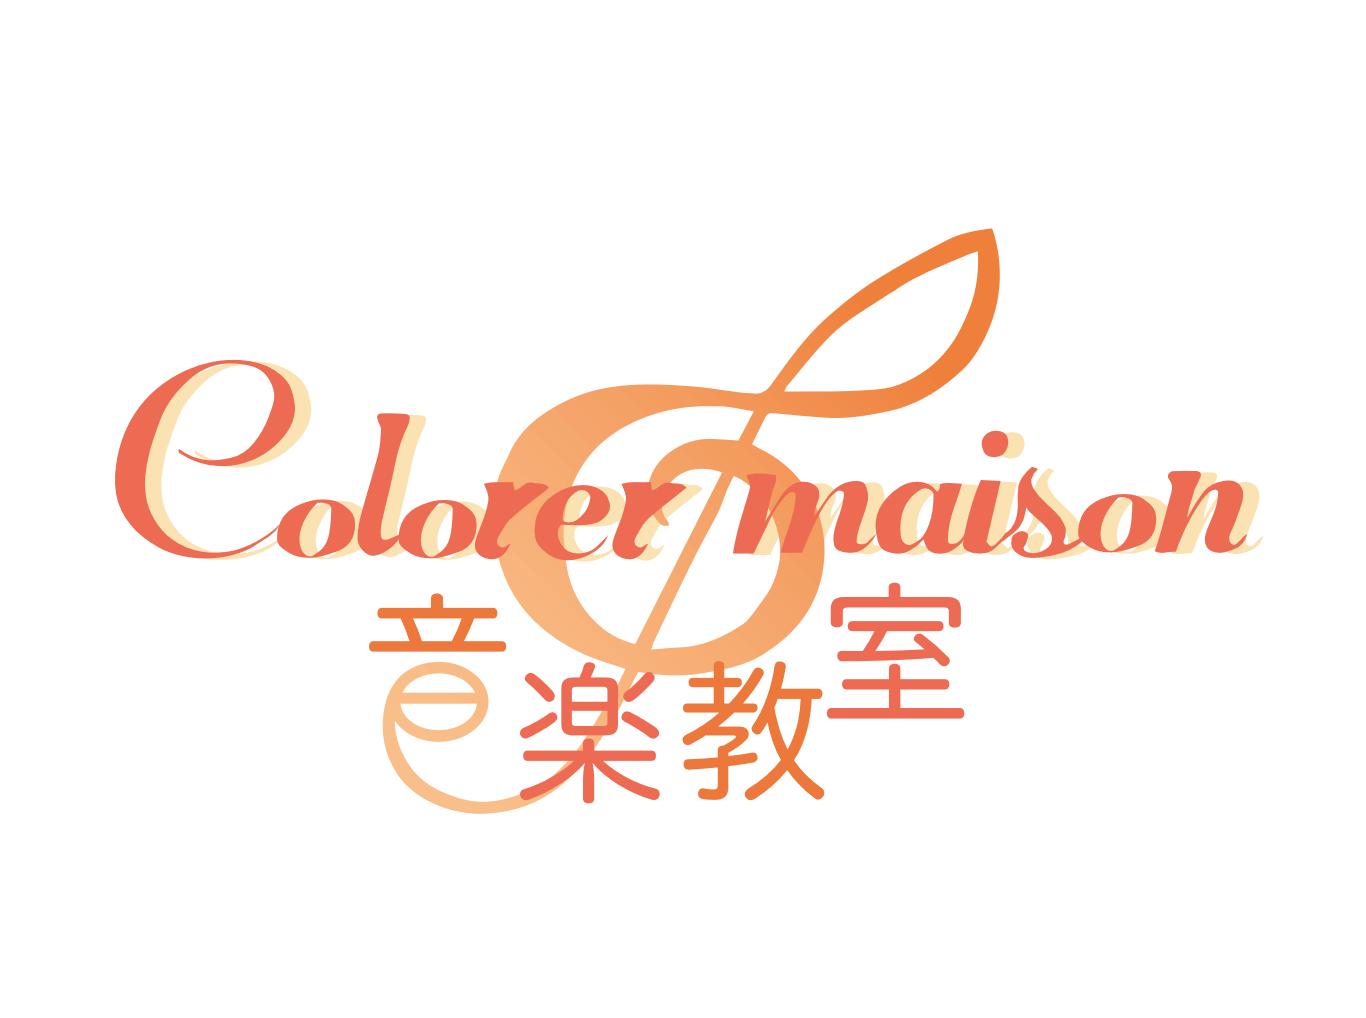 Colorer maison音楽教室